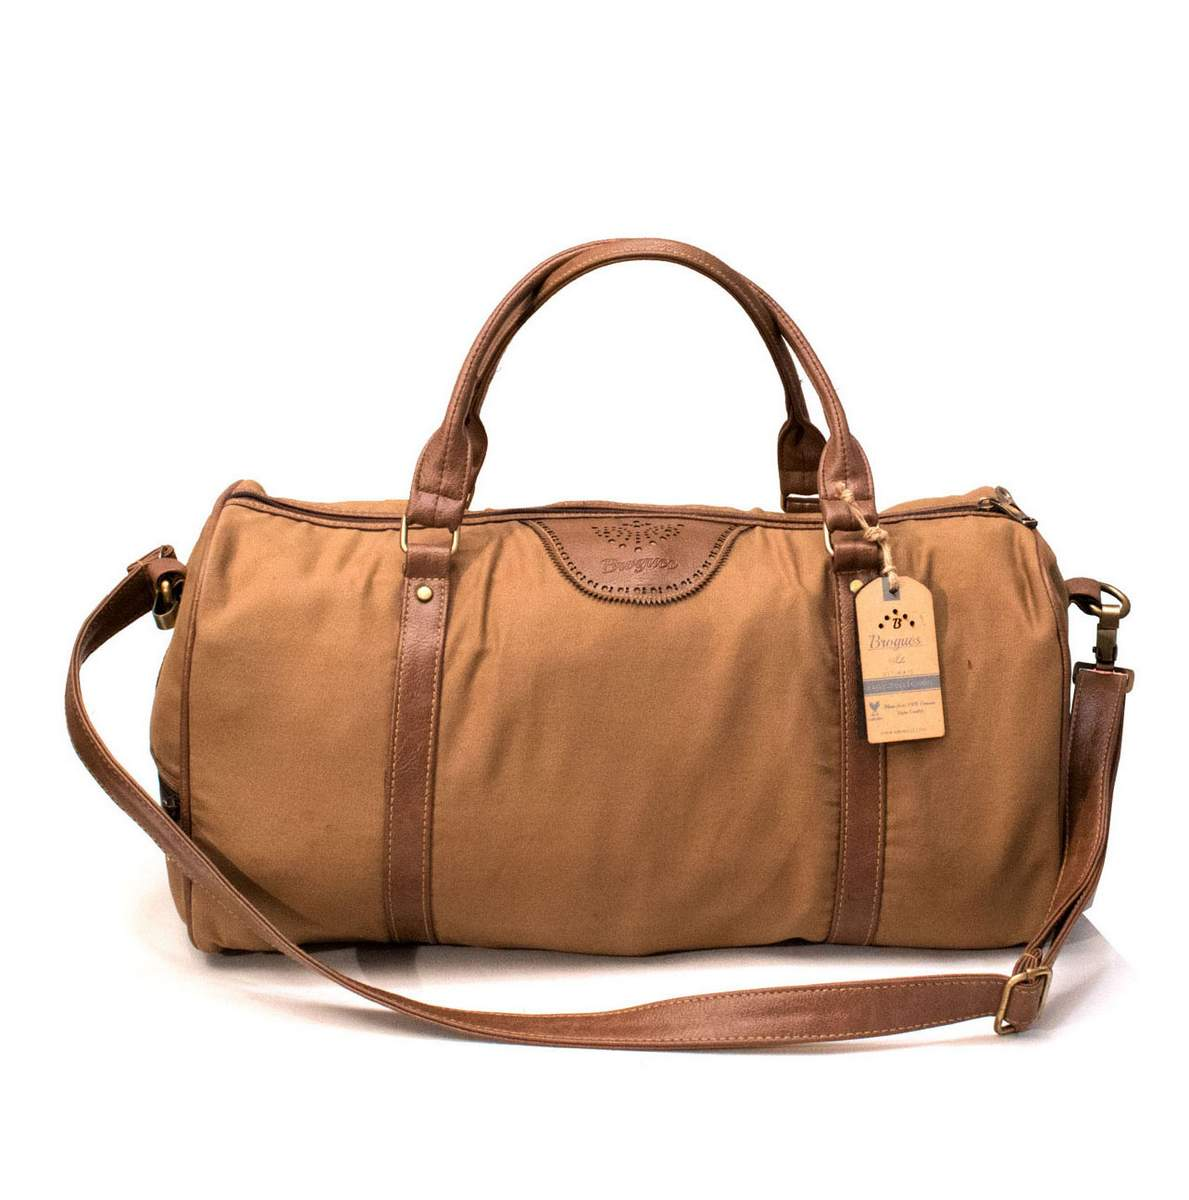 Brogues Paisley Leather Duffle Bag - Sunrise Trading Co (Bangalore) 3bc4b93883ca3